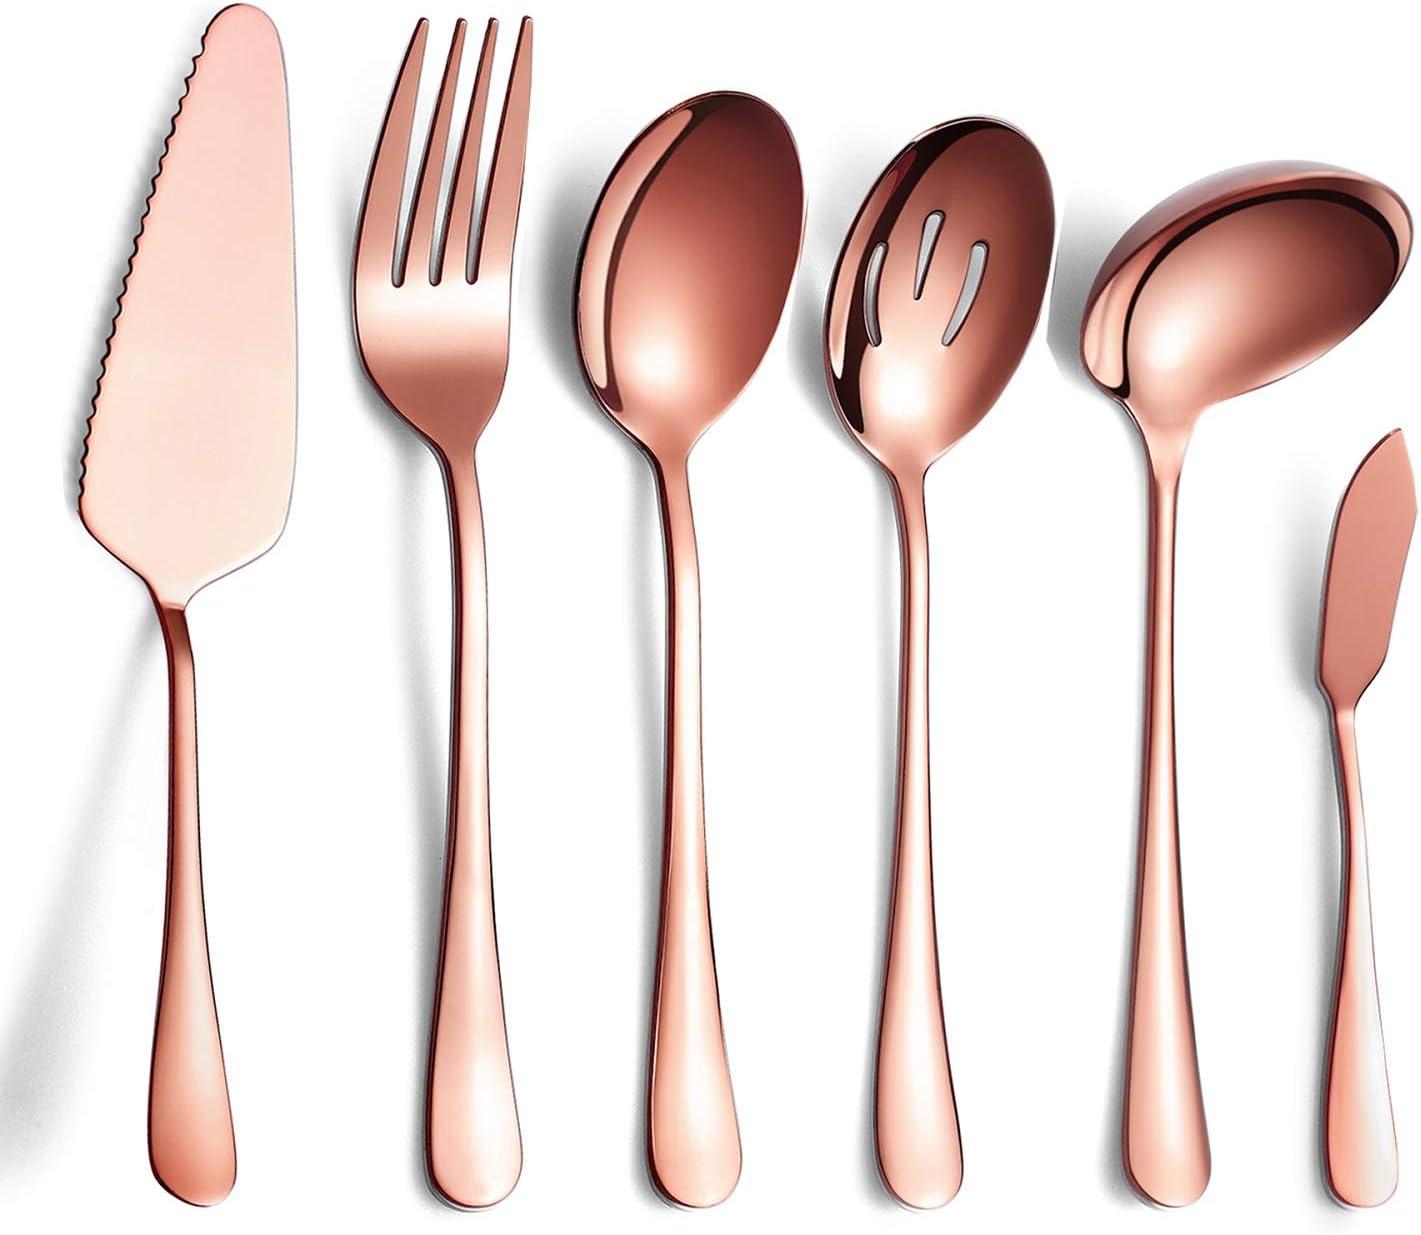 6-Piece Copper Serving Flatware Silverware Set,Stainless Steel Serving Utensil Set,Include Cake Server, Slotted Serving Spoon, Serving Spoon, Cold Meat Fork, Butter Knife, Soup Ladle